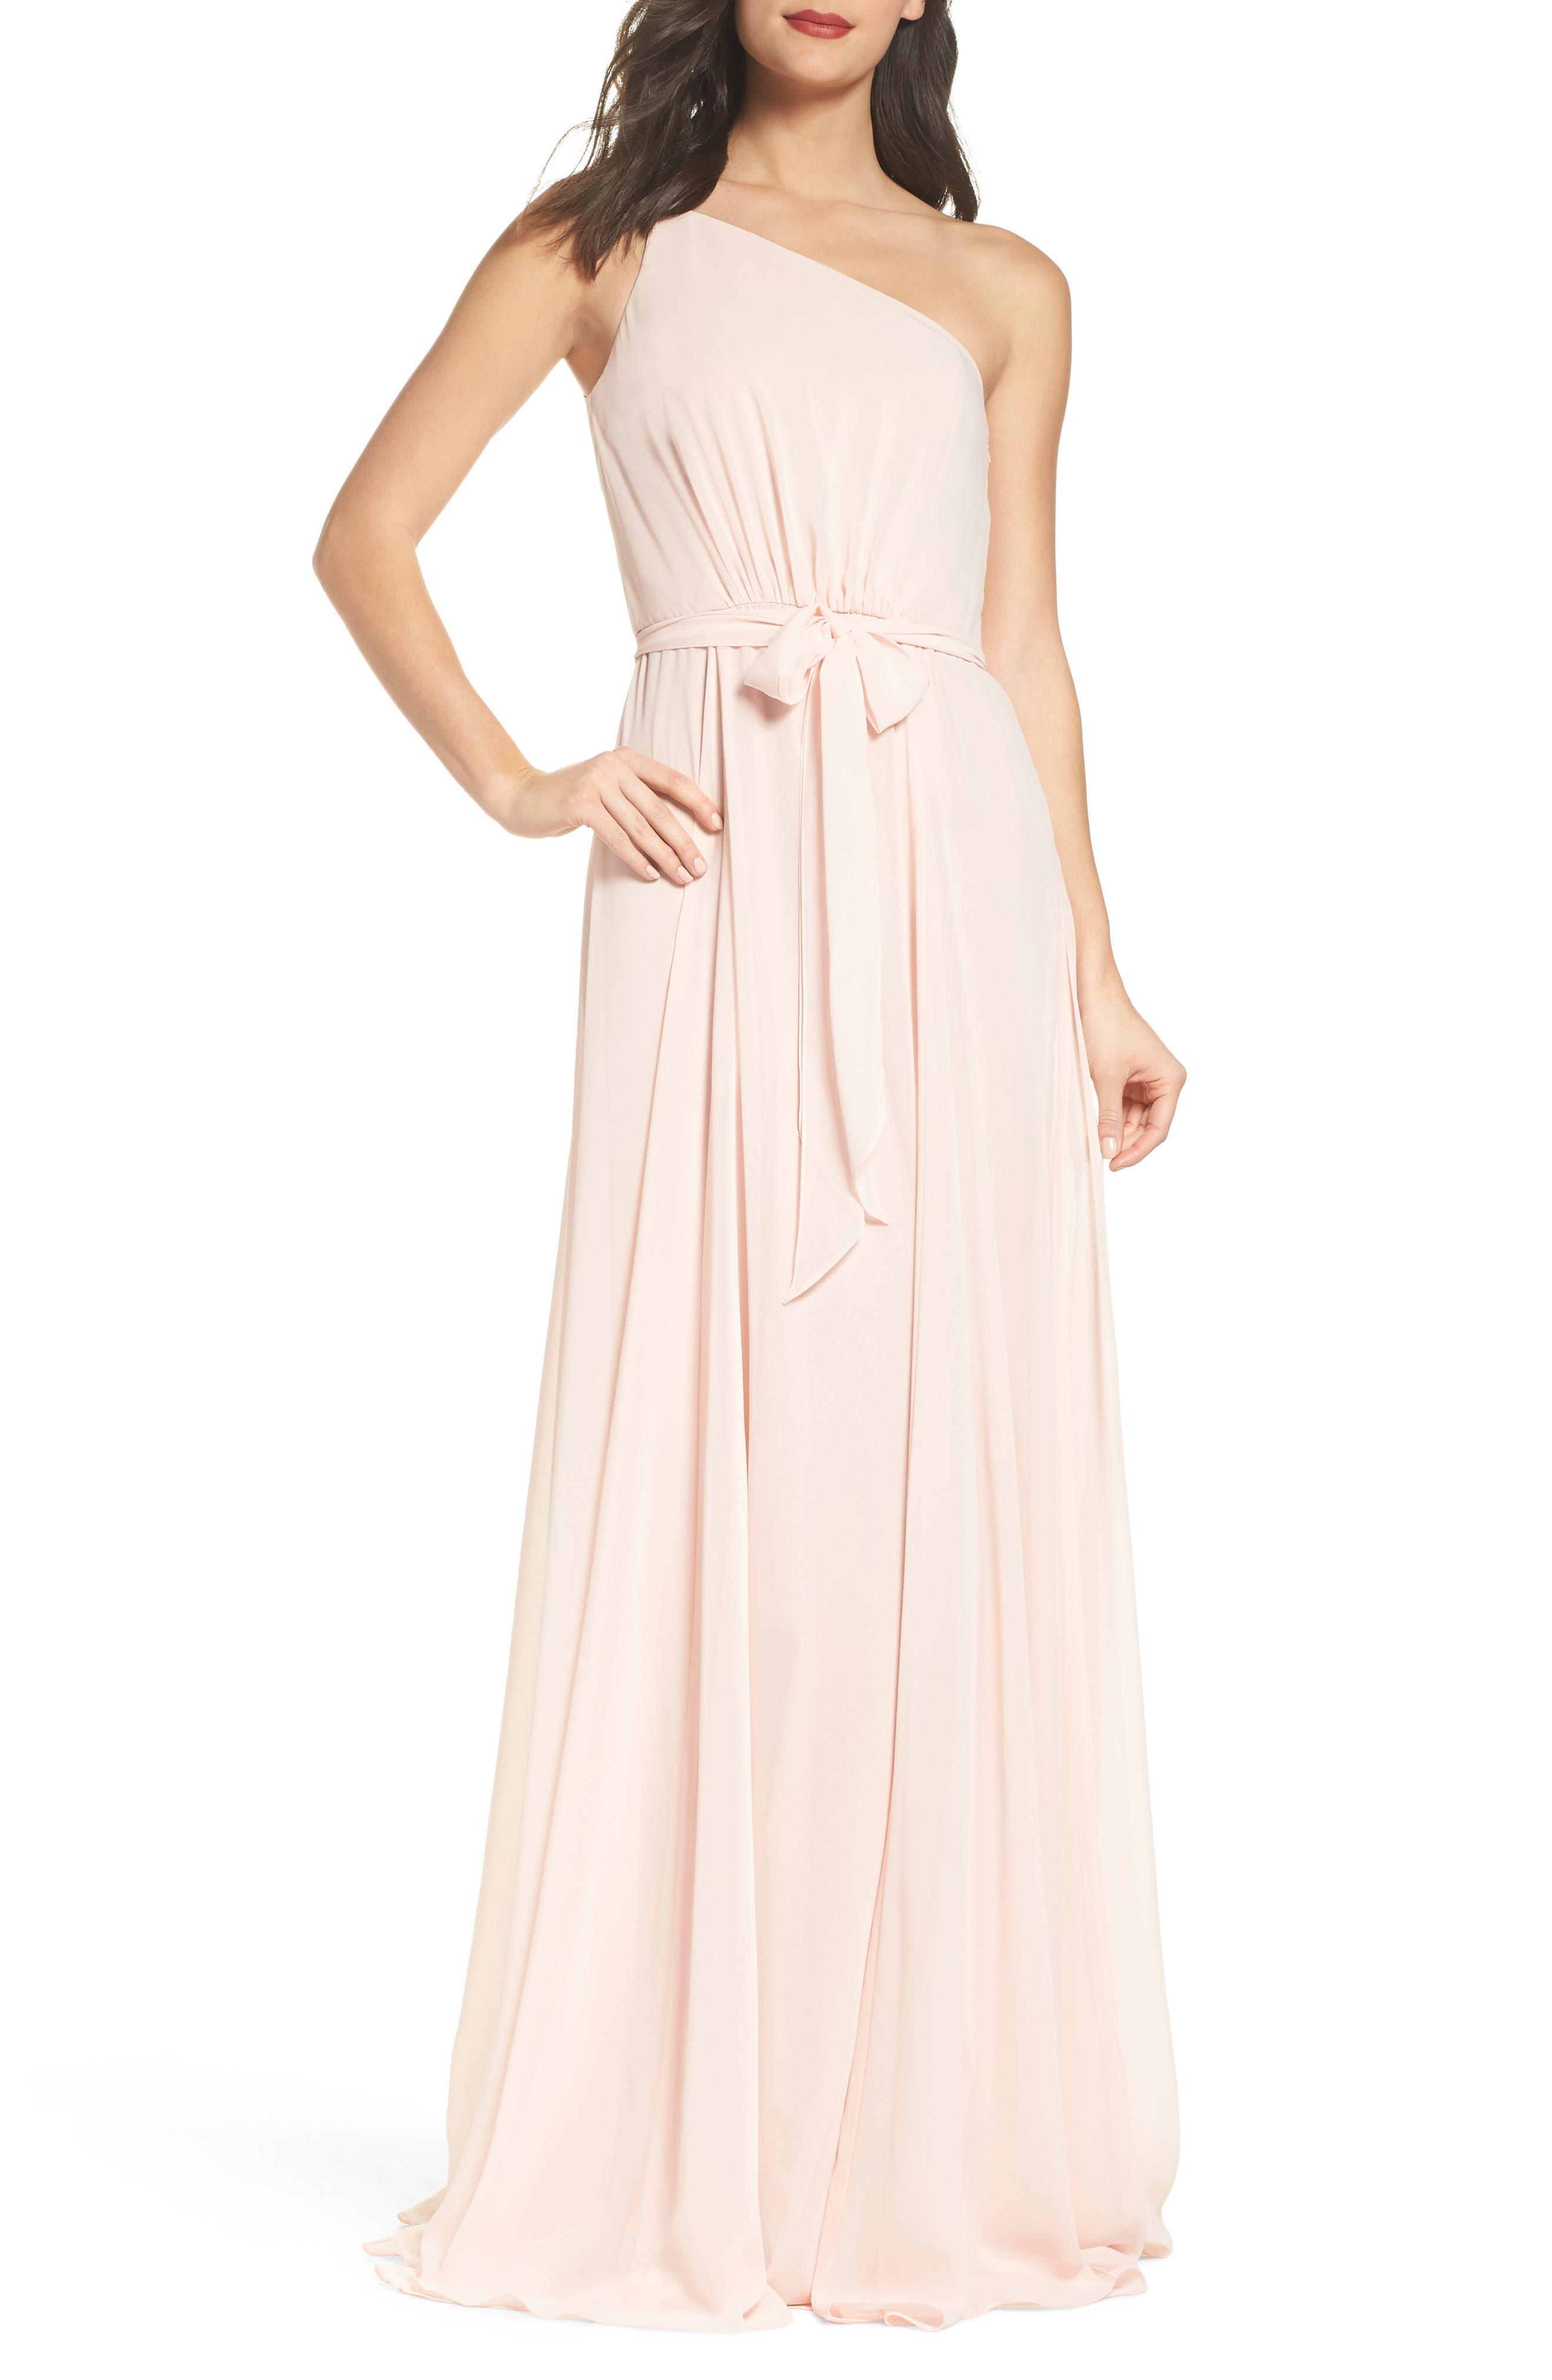 Main Image - Amsale One-Shoulder Chiffon A-Line Gown